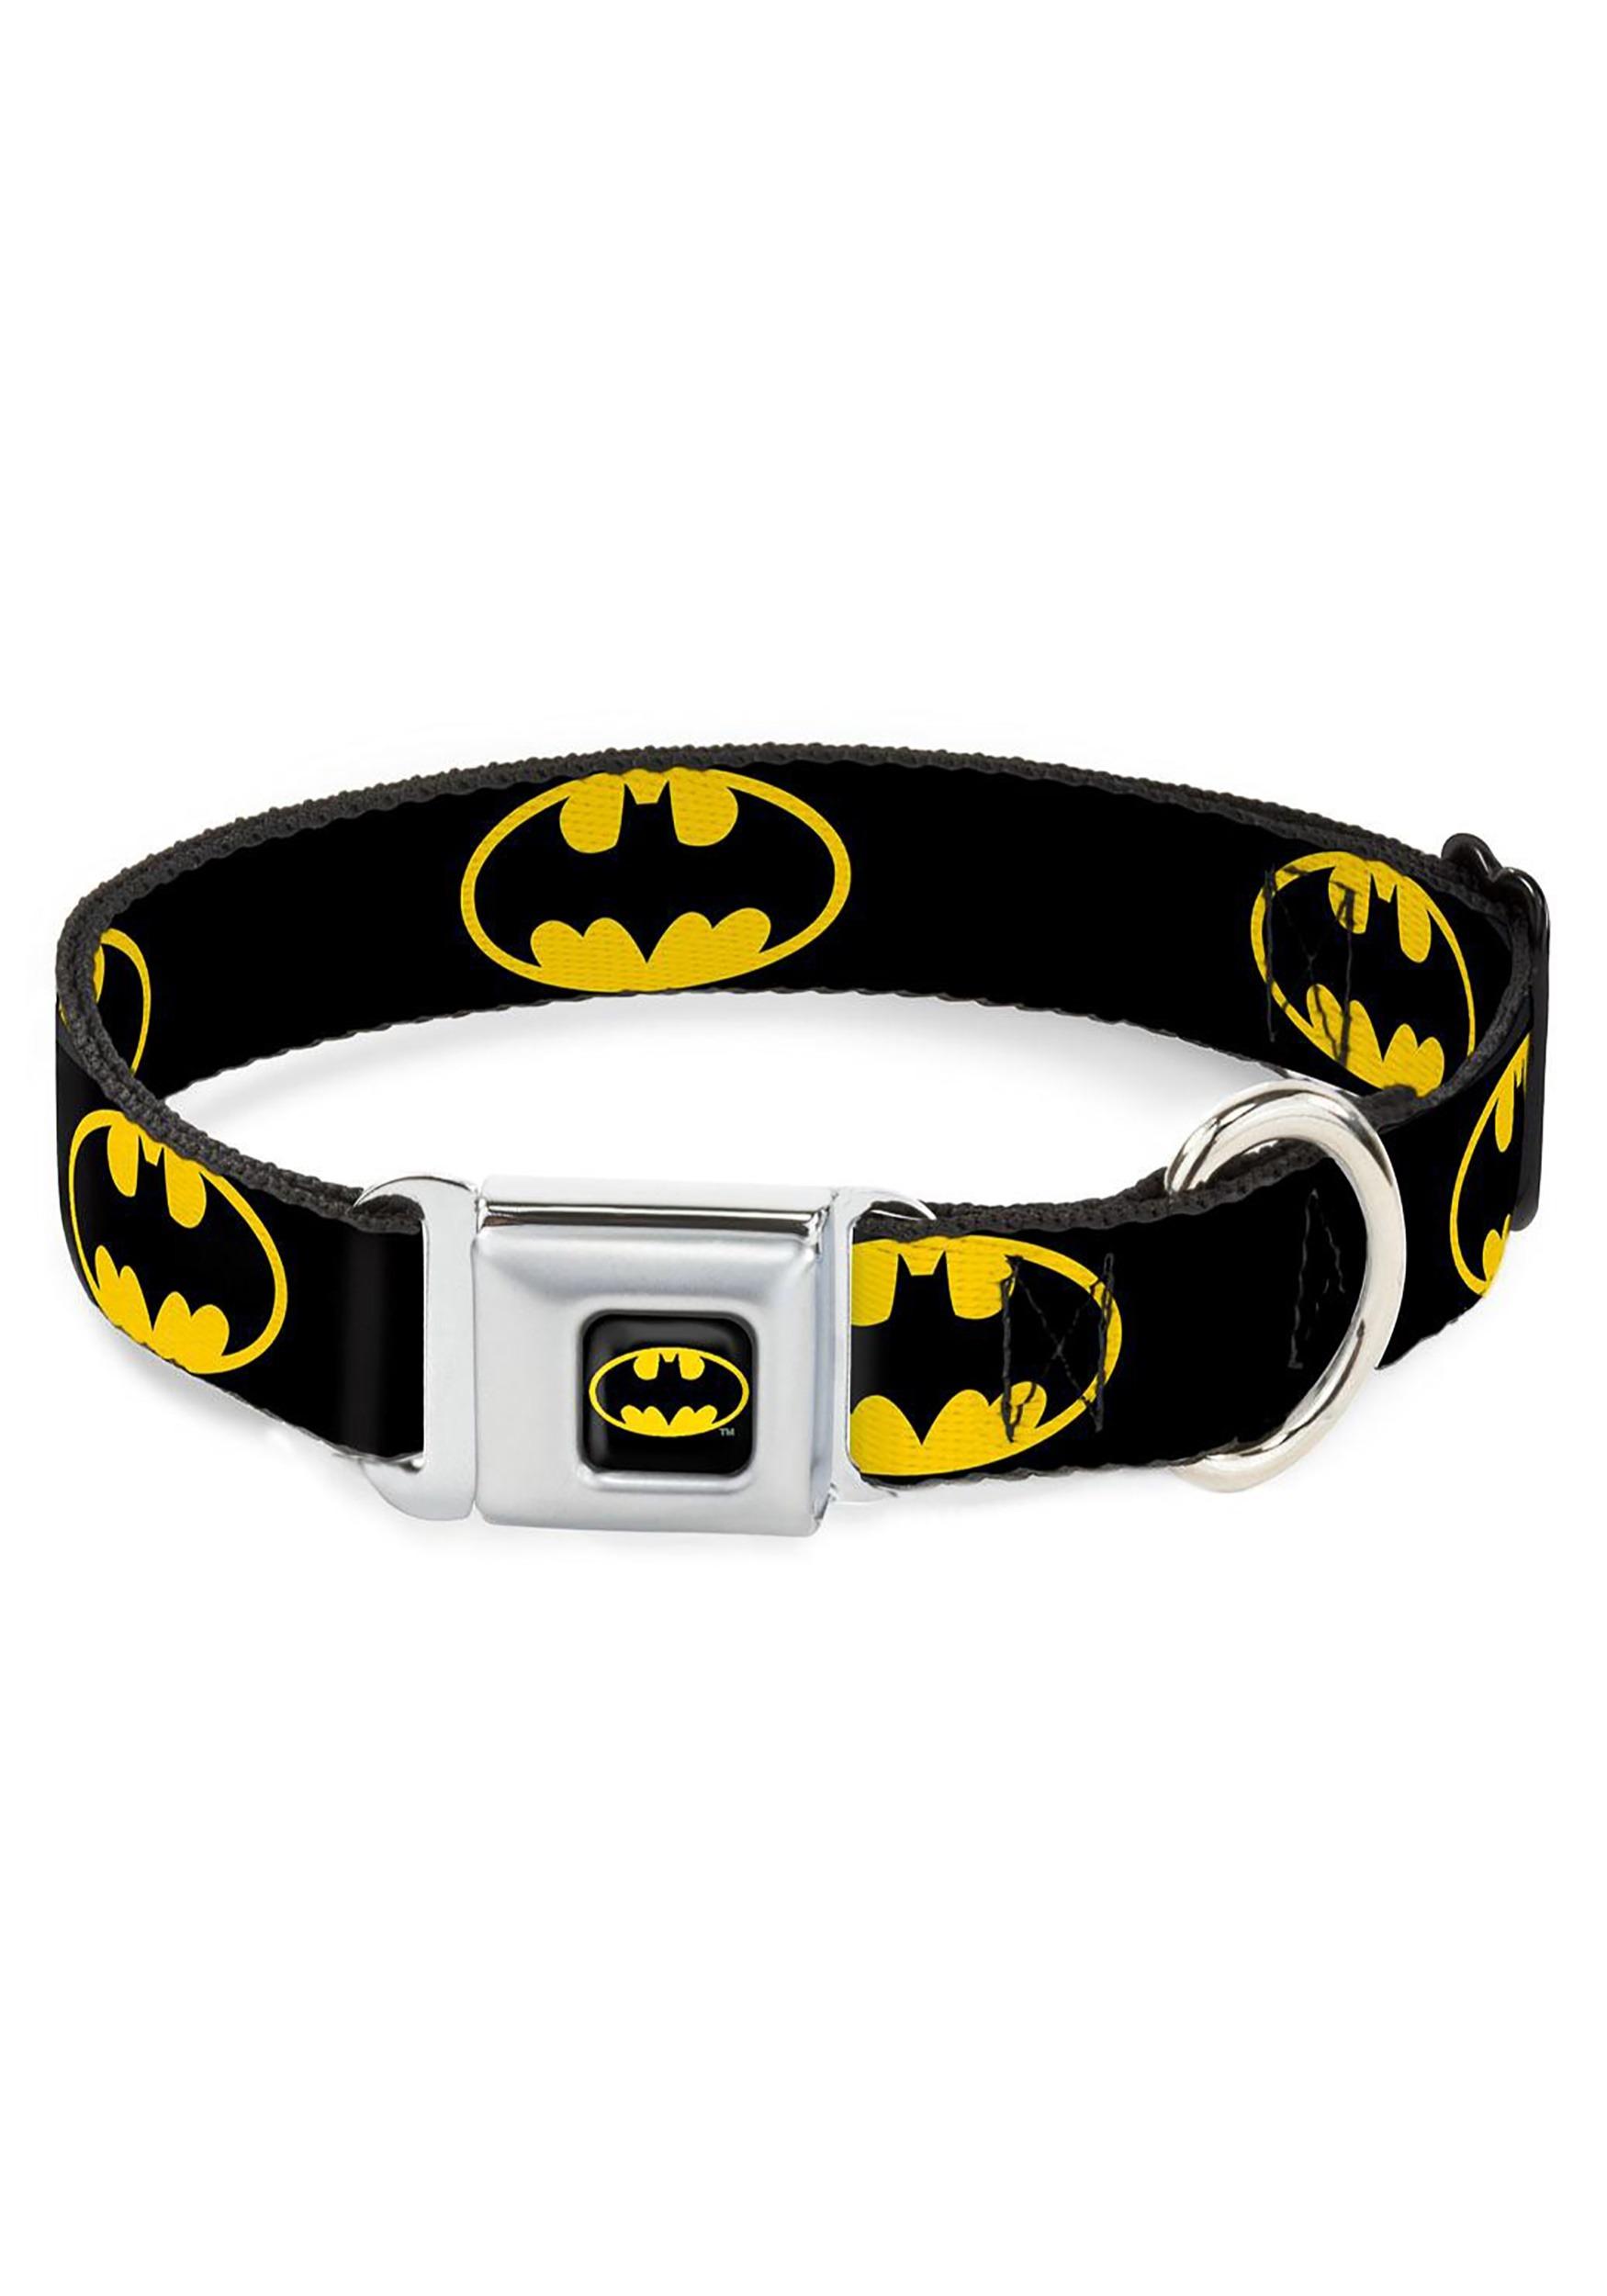 Batman_Logo_Black_Seatbelt_Buckle_Dog_Collar_1_Wide